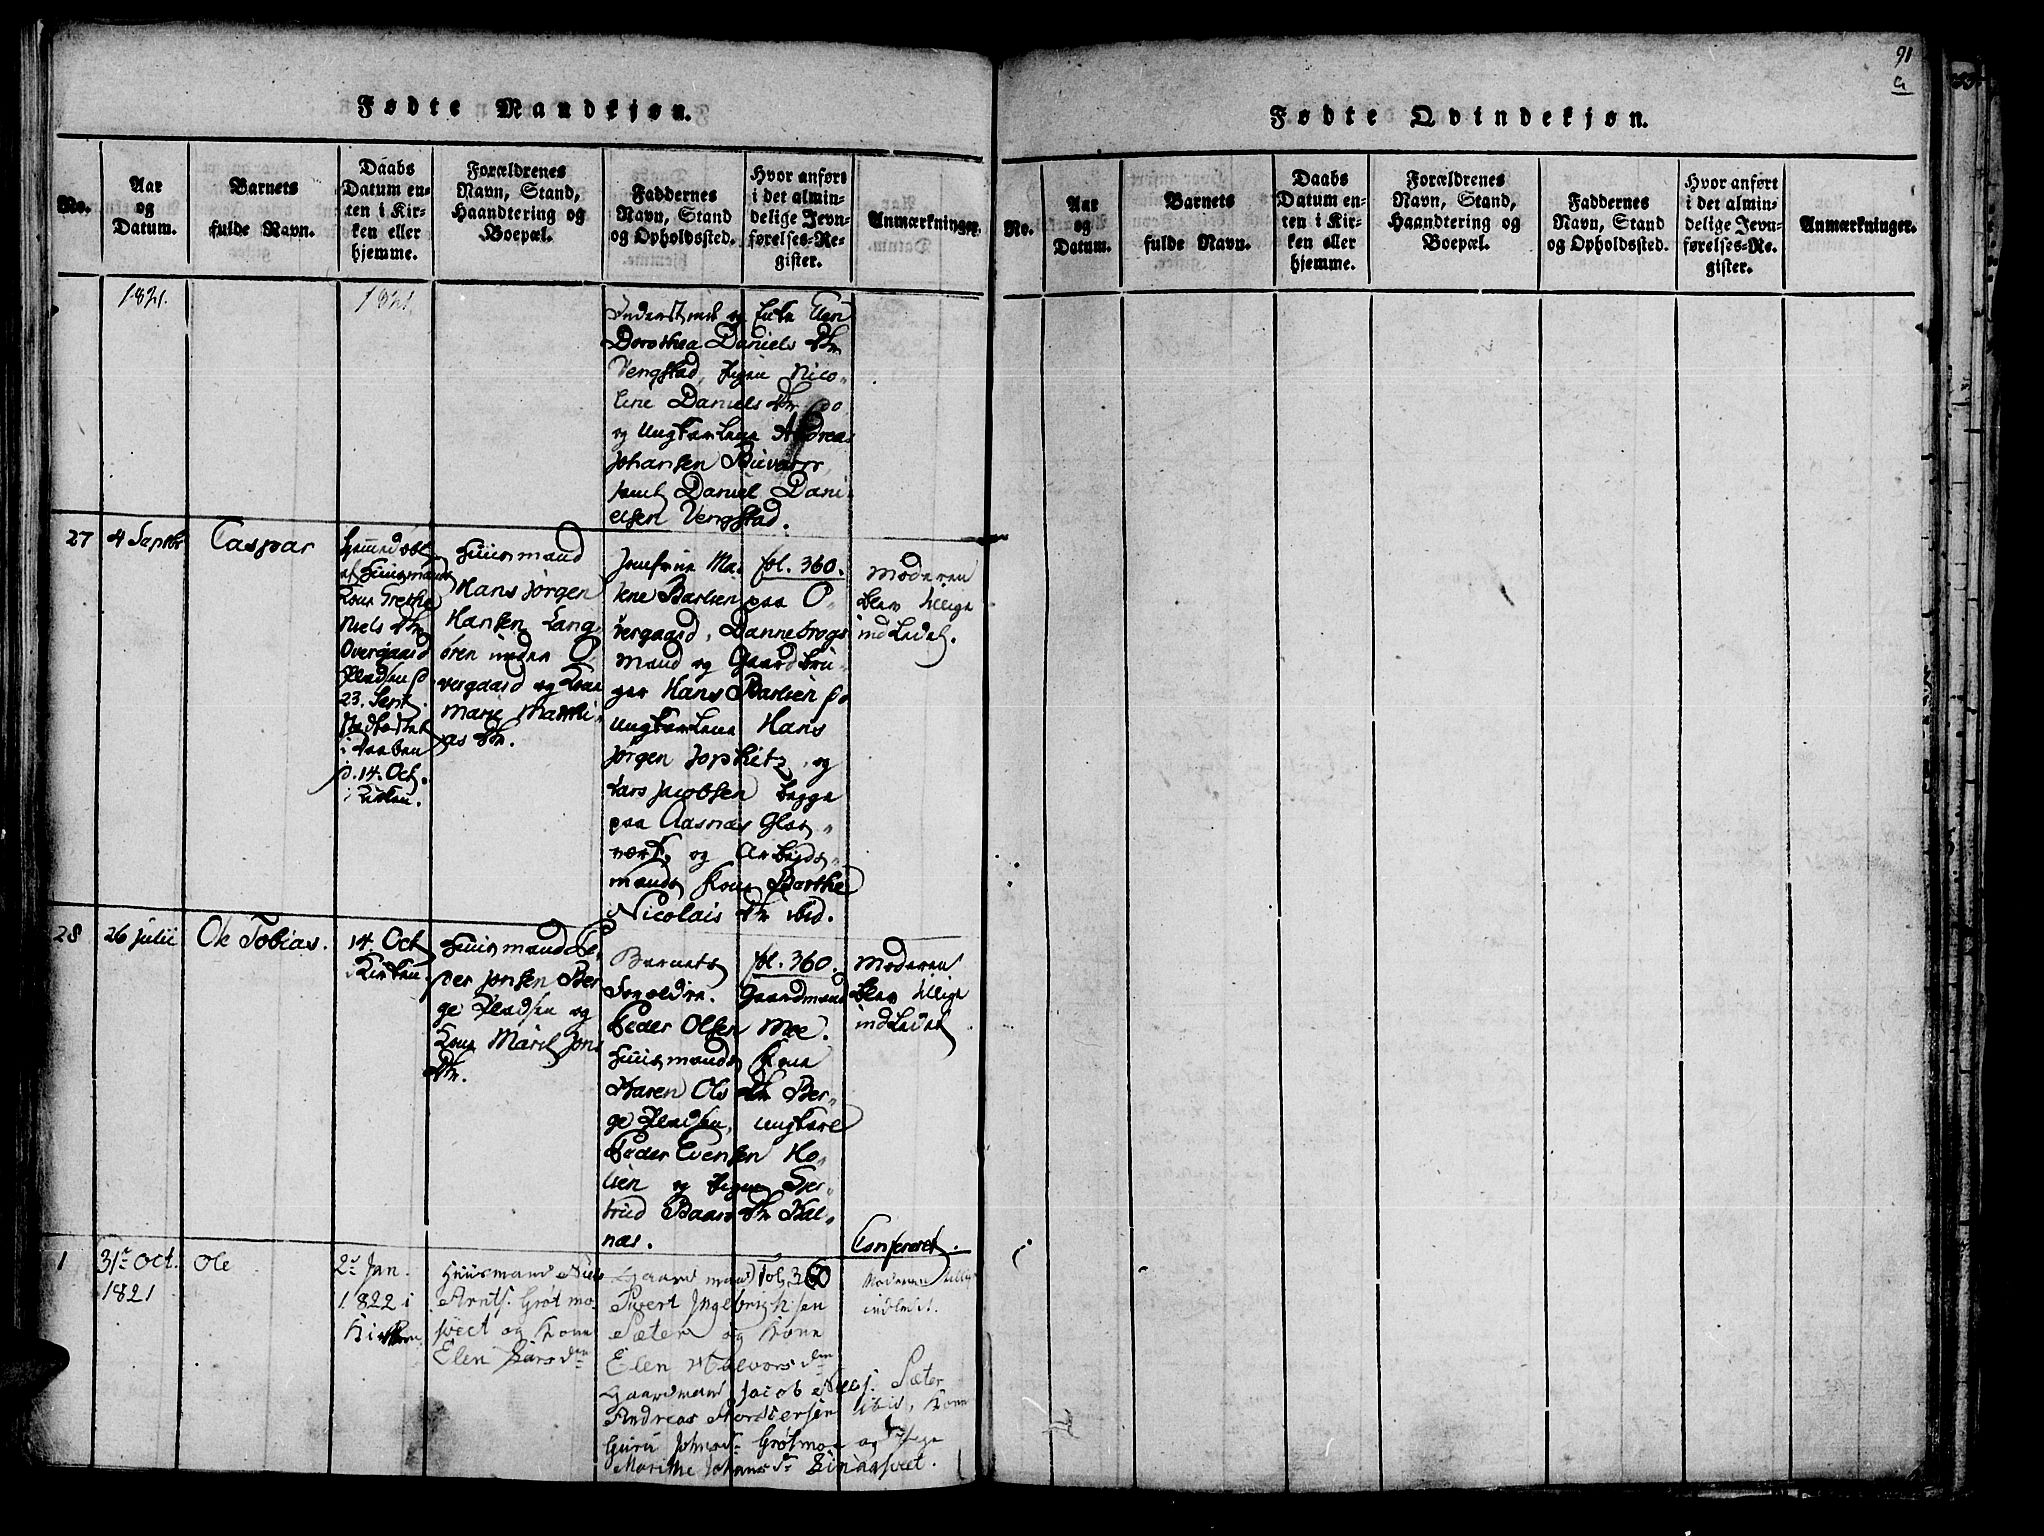 SAT, Ministerialprotokoller, klokkerbøker og fødselsregistre - Nord-Trøndelag, 741/L0387: Ministerialbok nr. 741A03 /3, 1817-1822, s. 91a